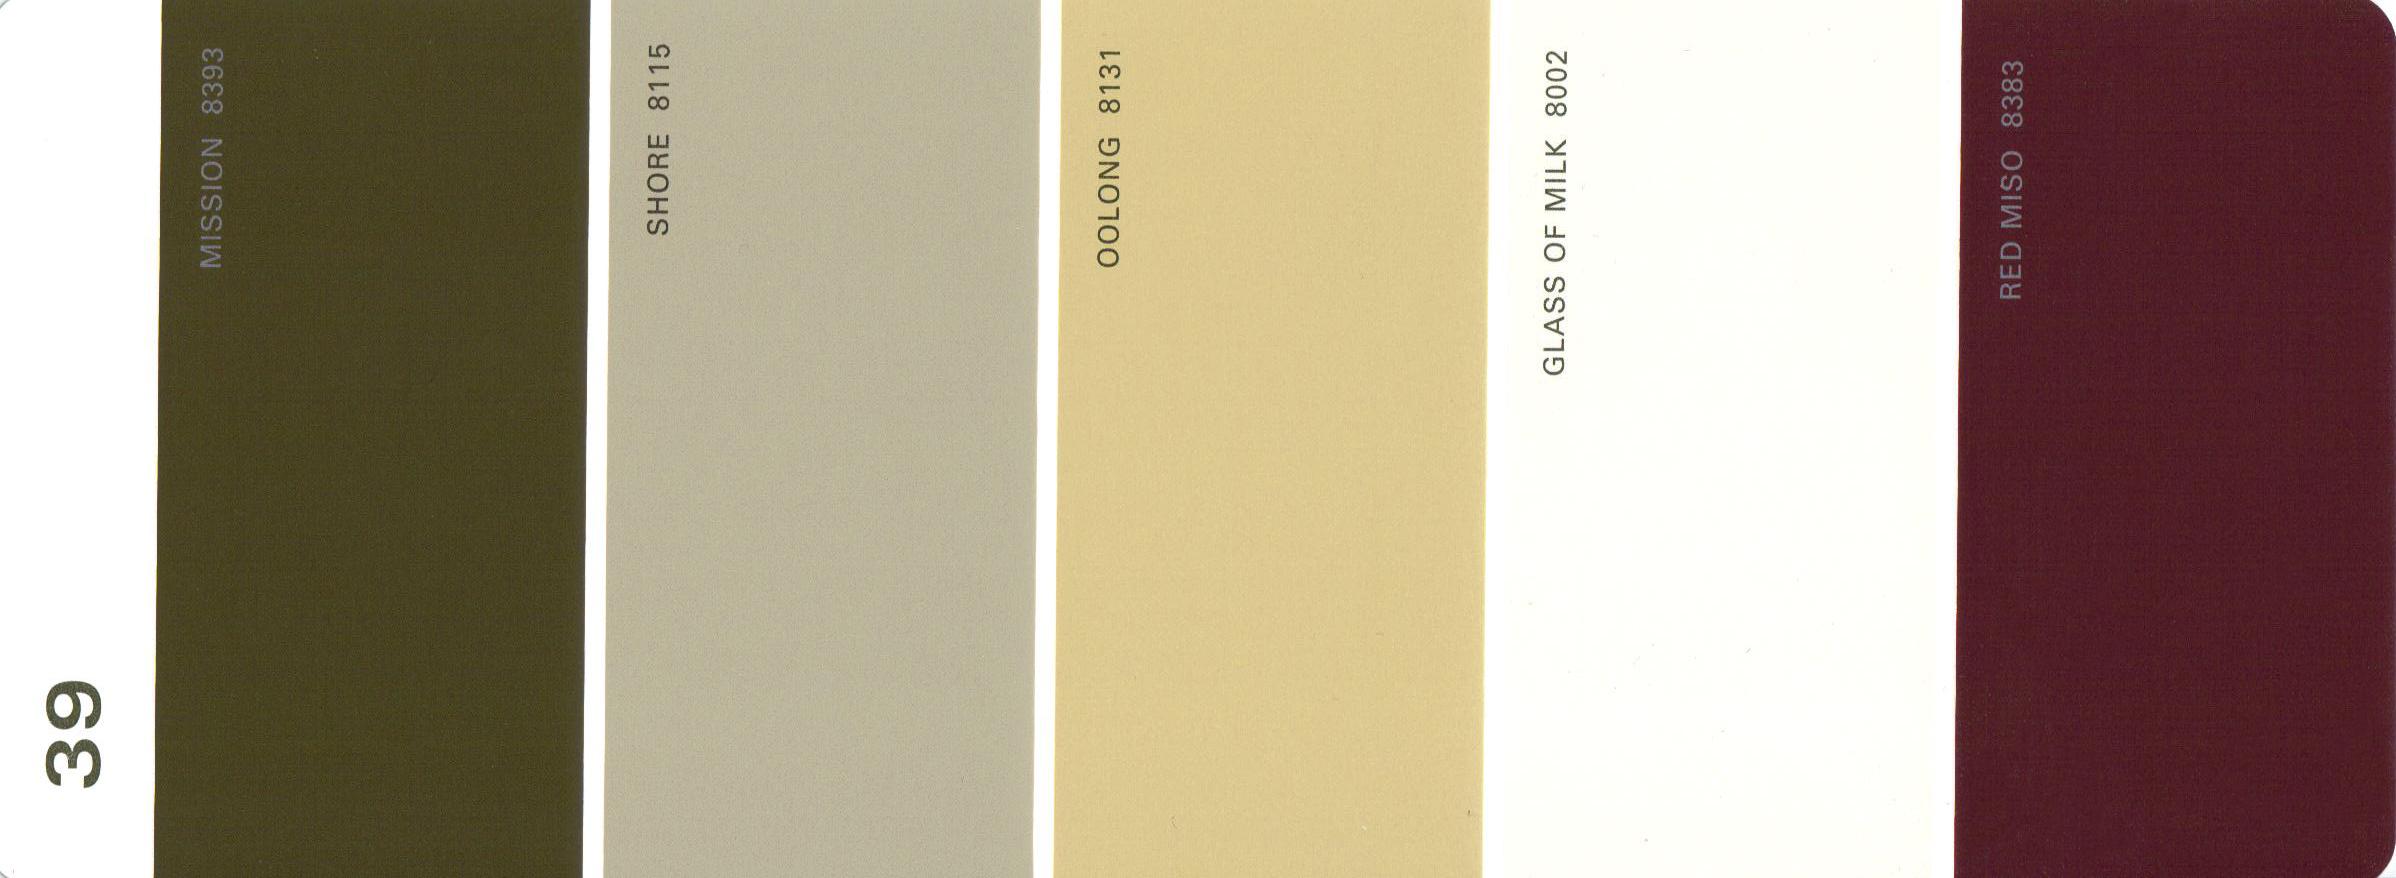 Martha stewart paint 5 color palette card 03 for Martha stewart exterior paint colors